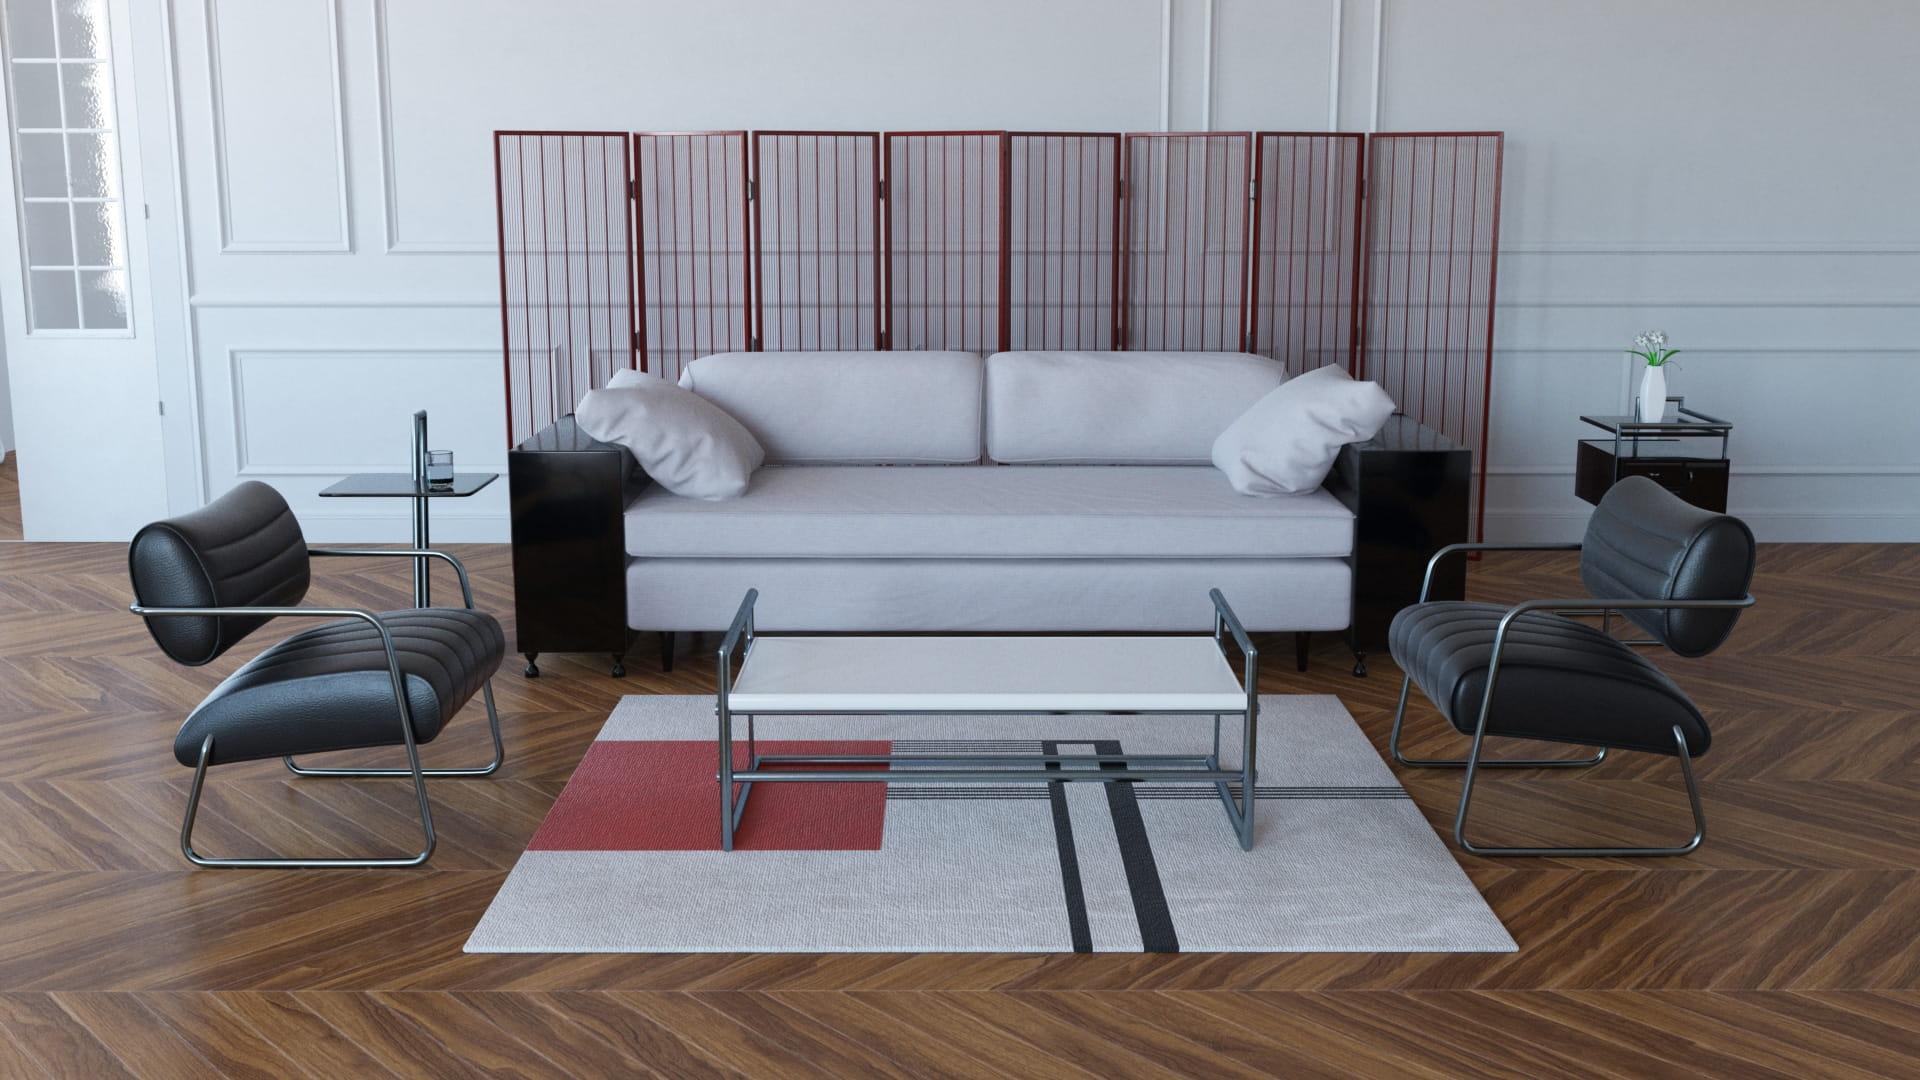 furniture set 13 AM253